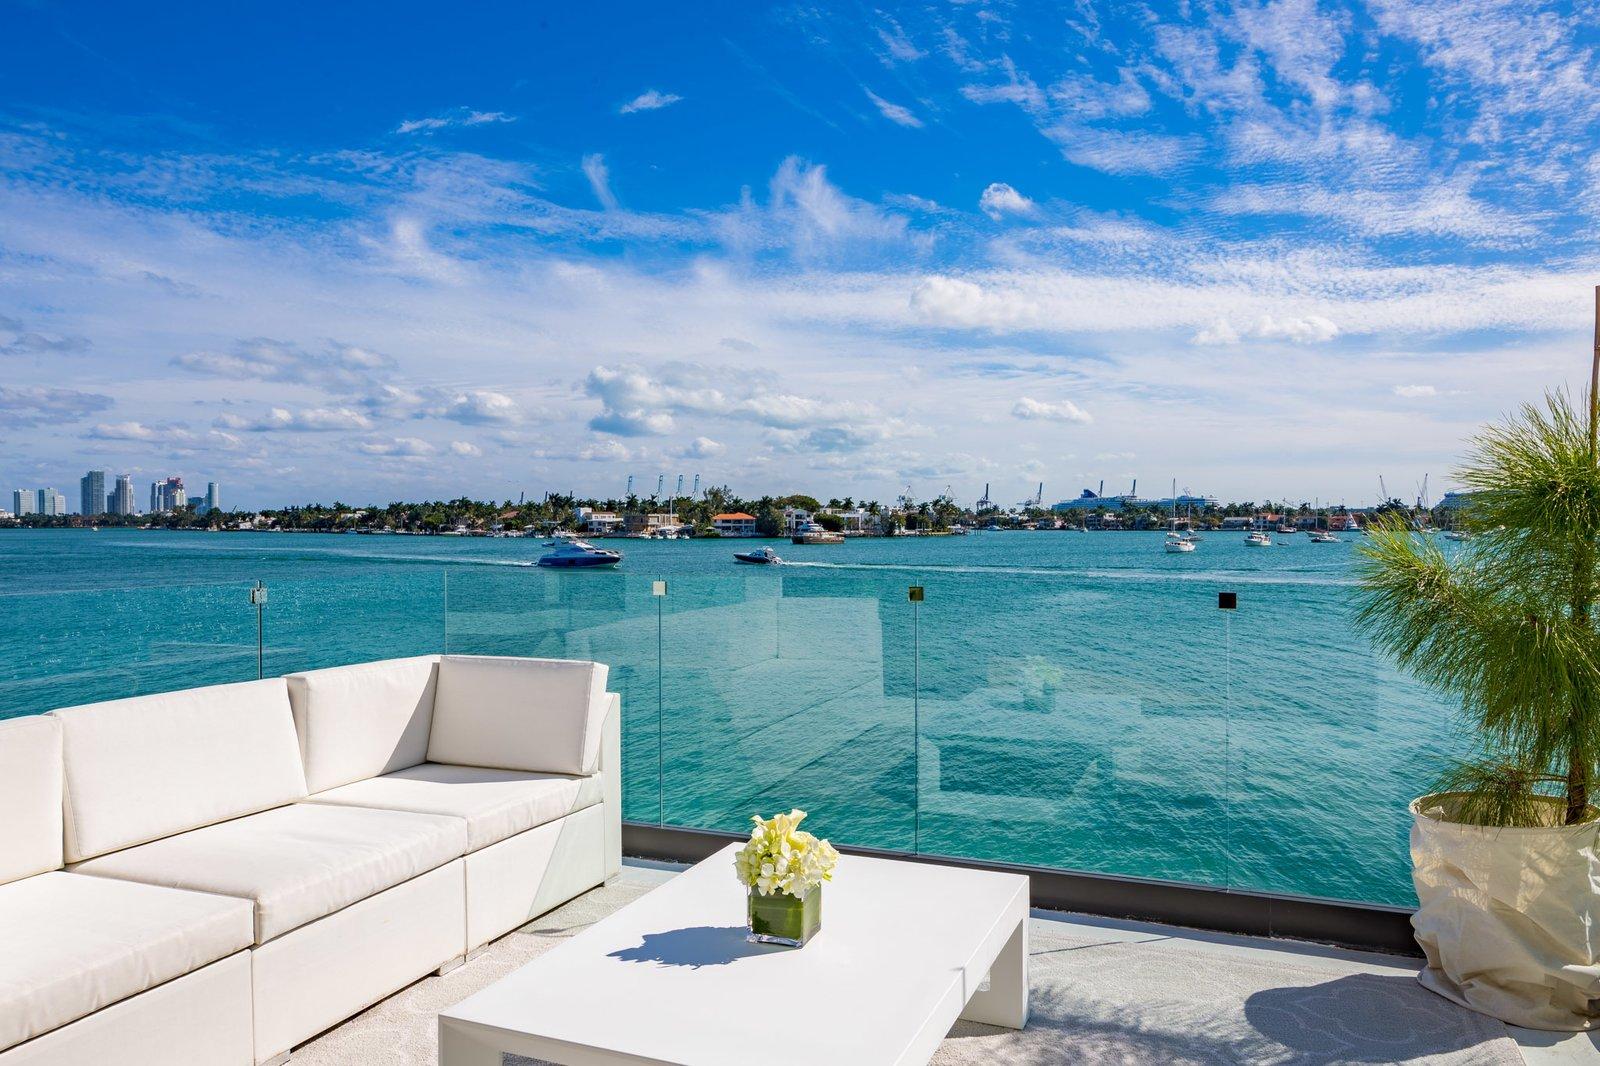 Rooftop Deck  Villa Venetian by Choeff Levy Fischman